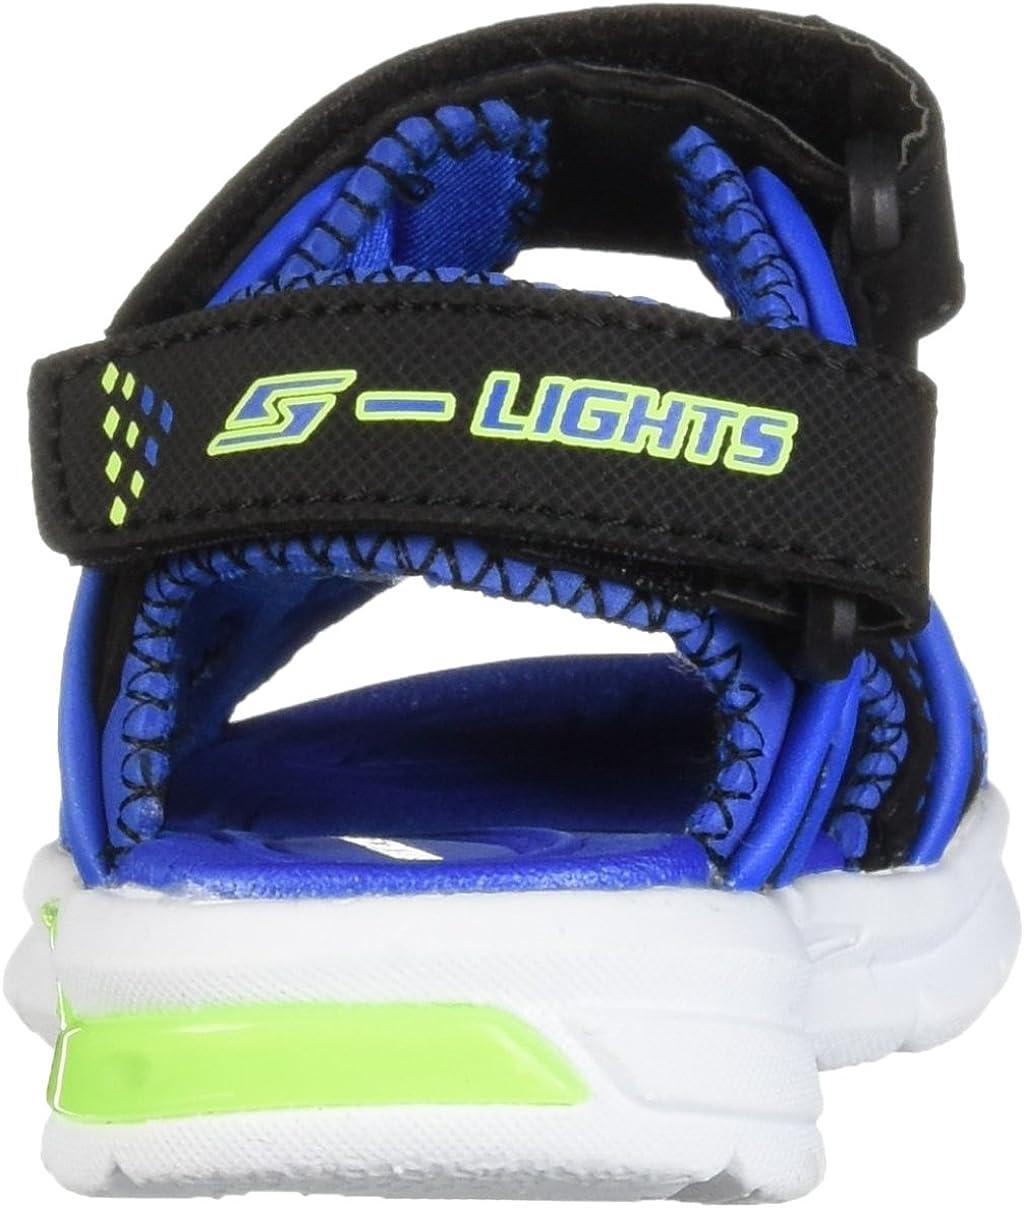 Skechers E-II Sandales Plateforme b/éb/é gar/çon